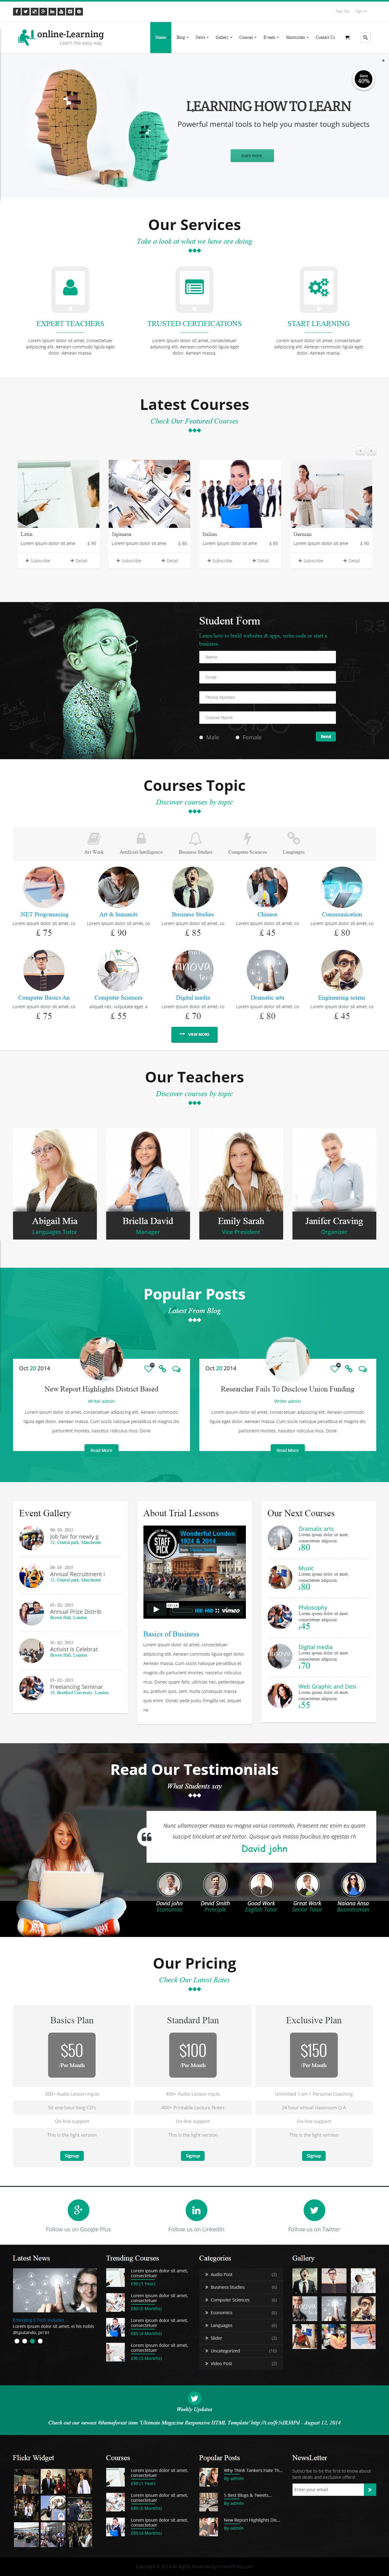 Iknow Premium Responsive Learning Management System Wordpress Theme